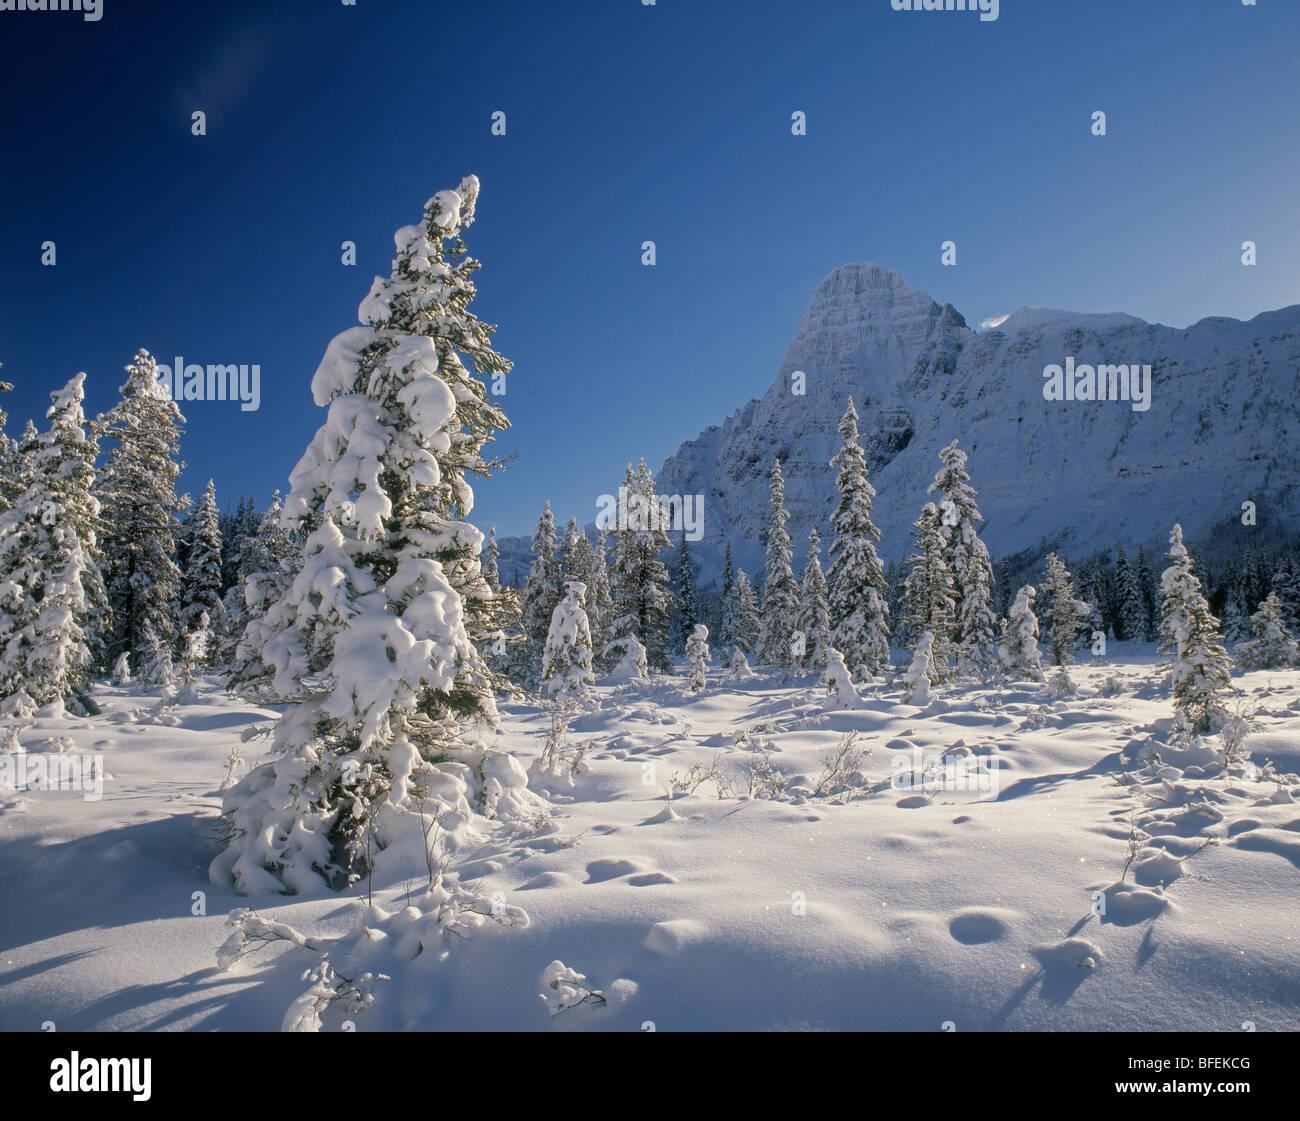 Mount Chephren and Mistaya Valley in winter, Banff National Park, Alberta, Canada - Stock Image